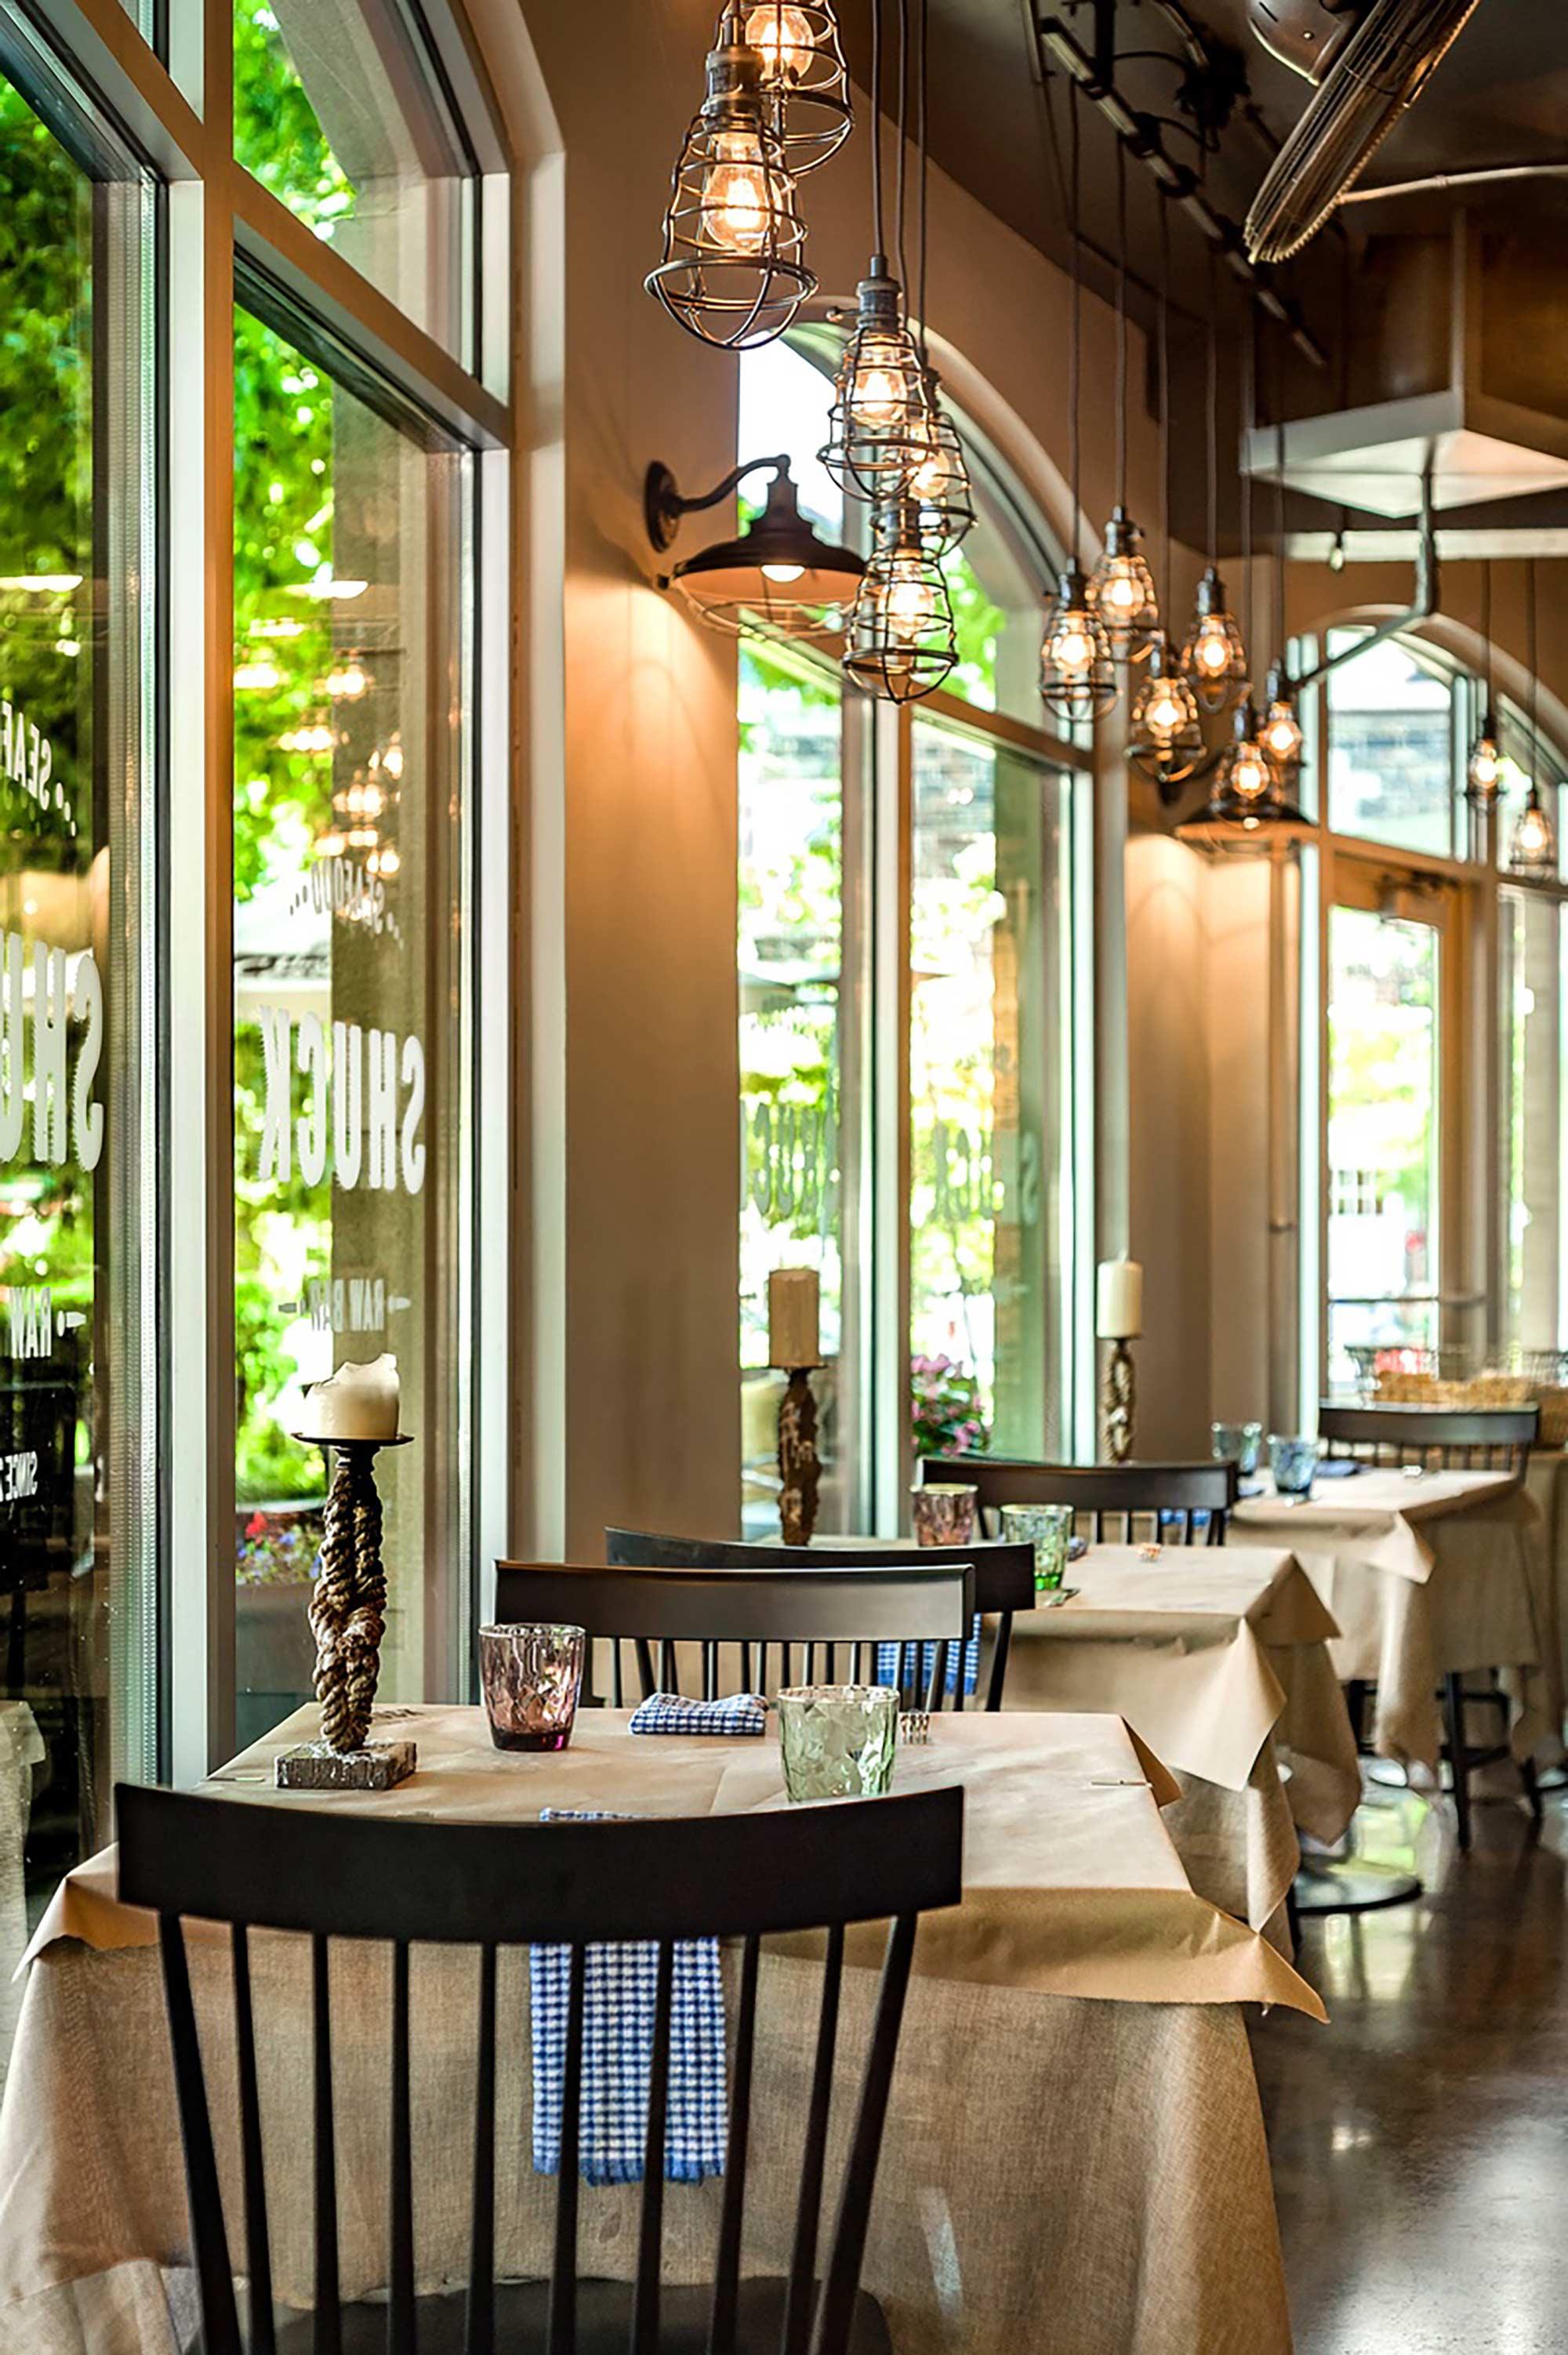 interior-design-seafood-restuarant-window-tables.jpg